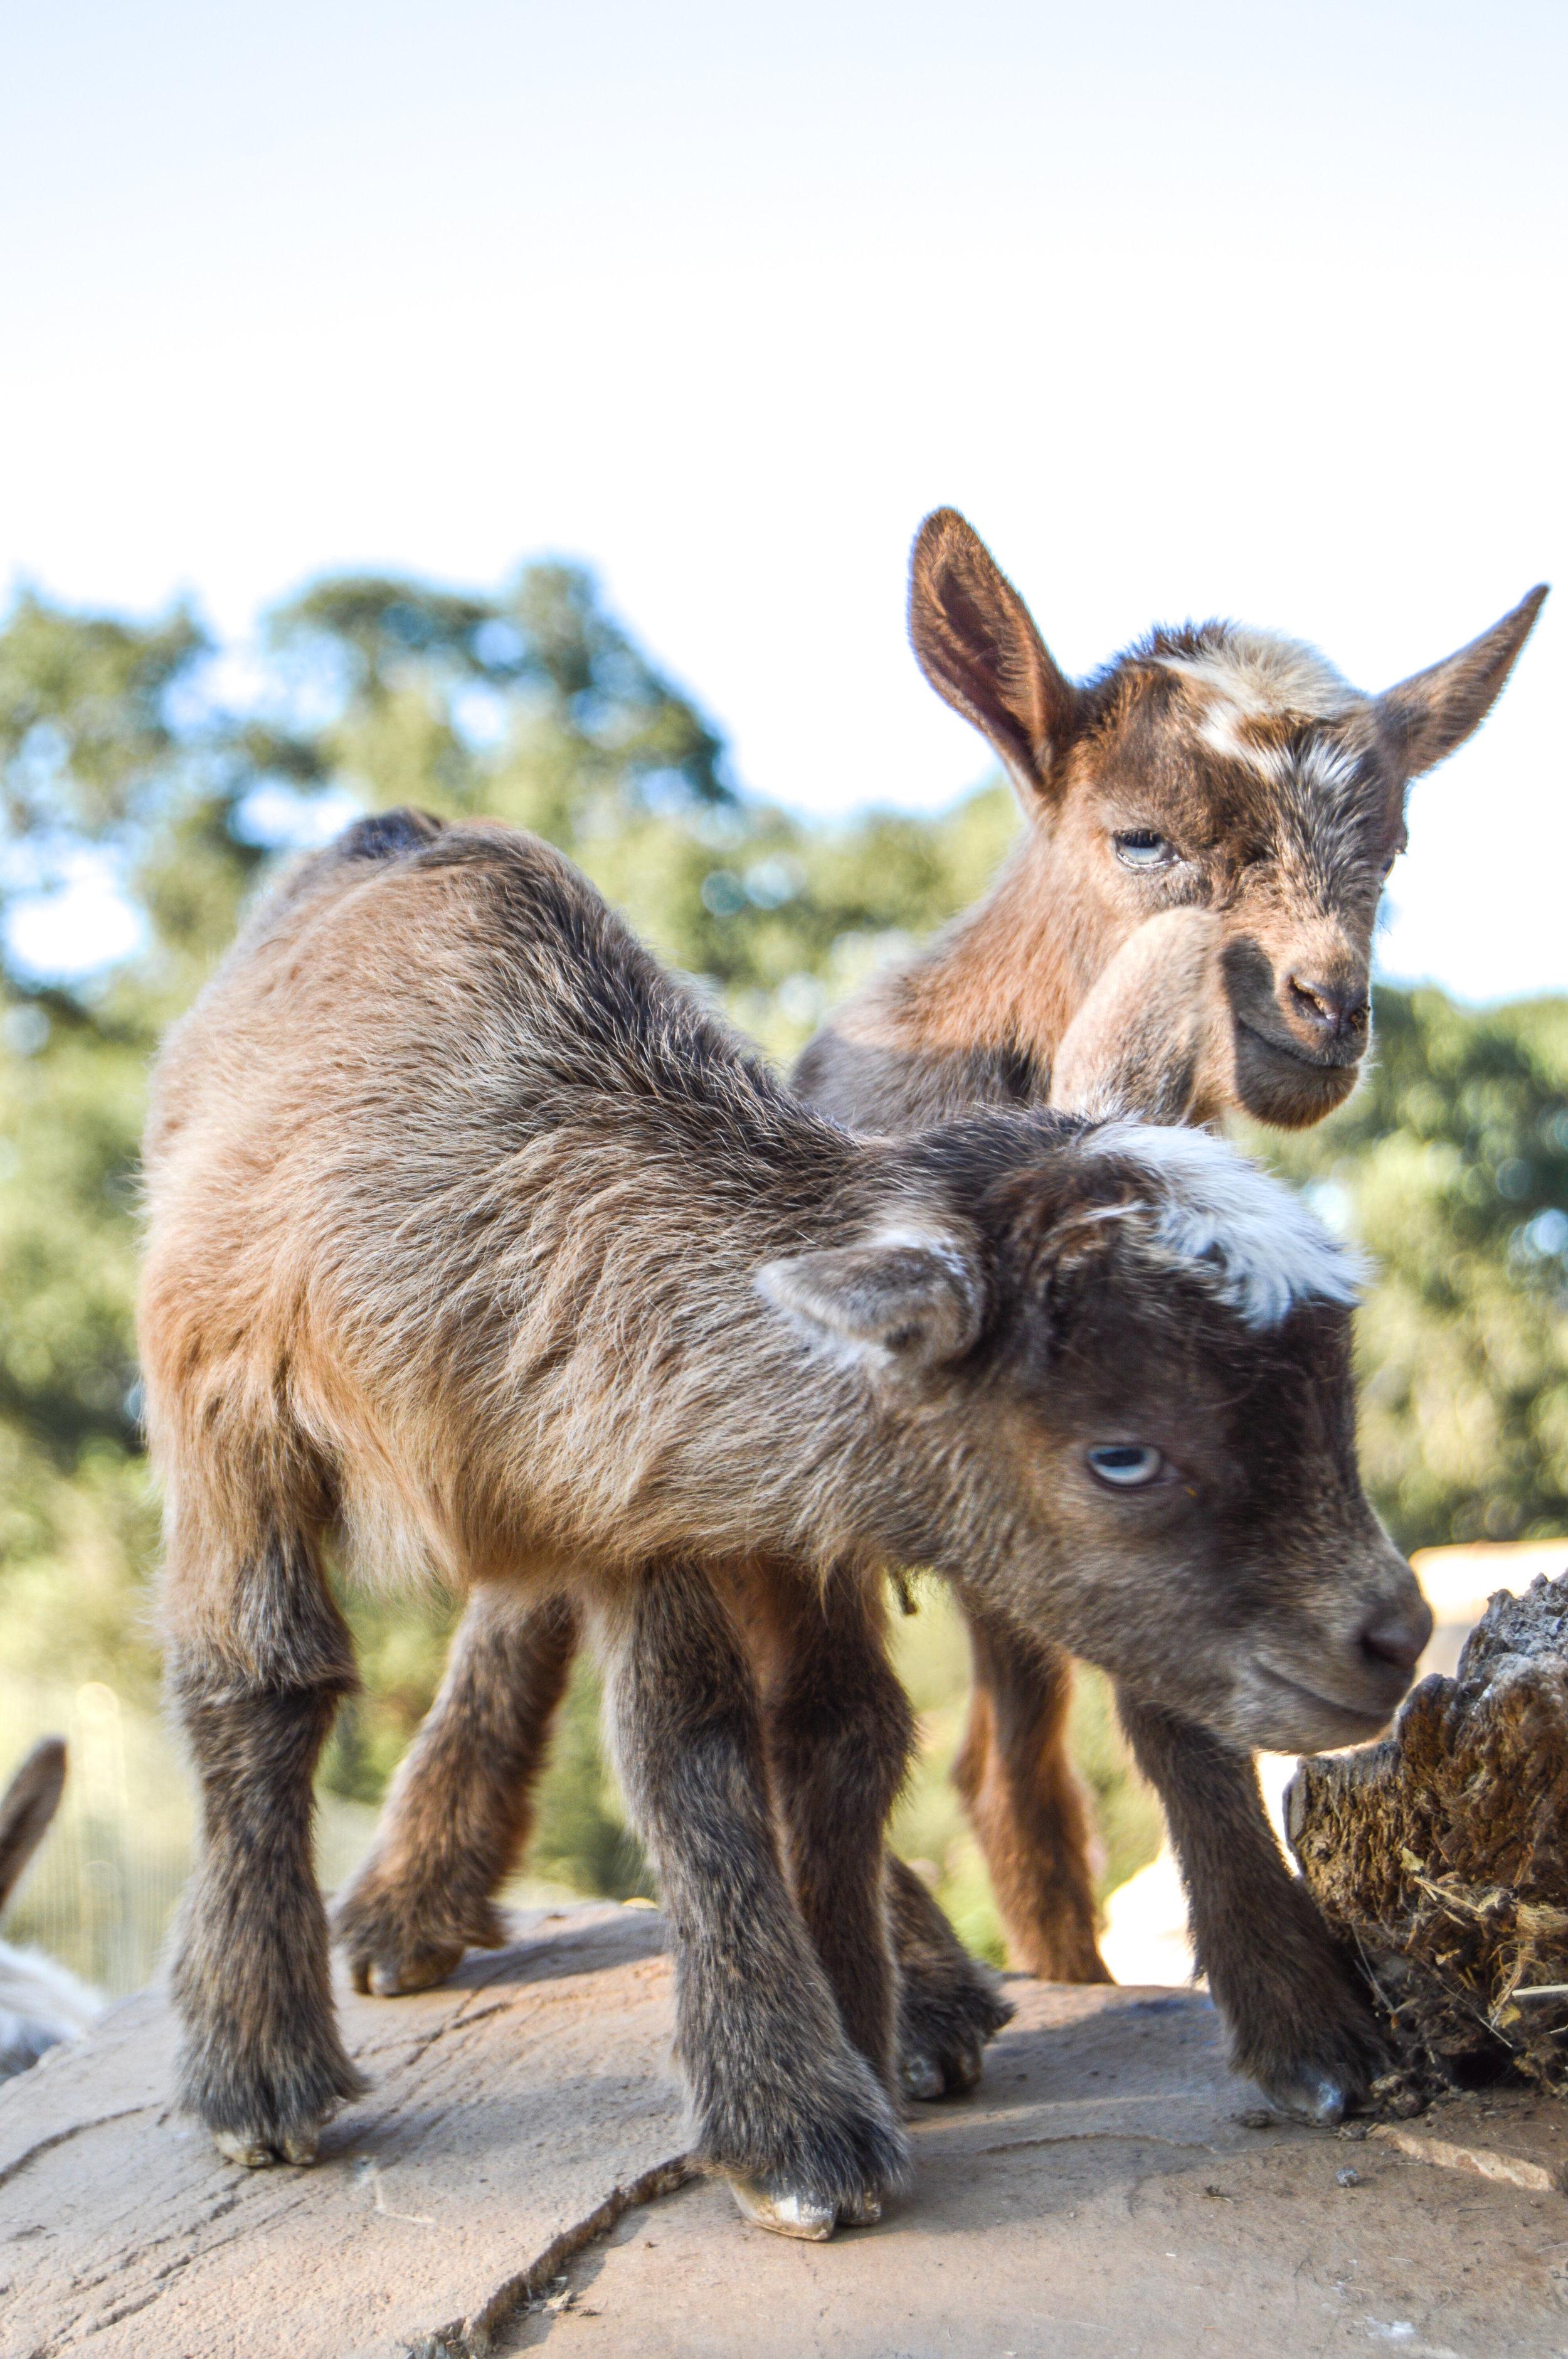 Baby Goat #babygoat, #goats, #farmanimals, #babyfarmanimals, #nigeriandwarf, #niferiangoat, #goatlove, #crazygoatlady, #homestead, #homesteadgoals, #babyanimals